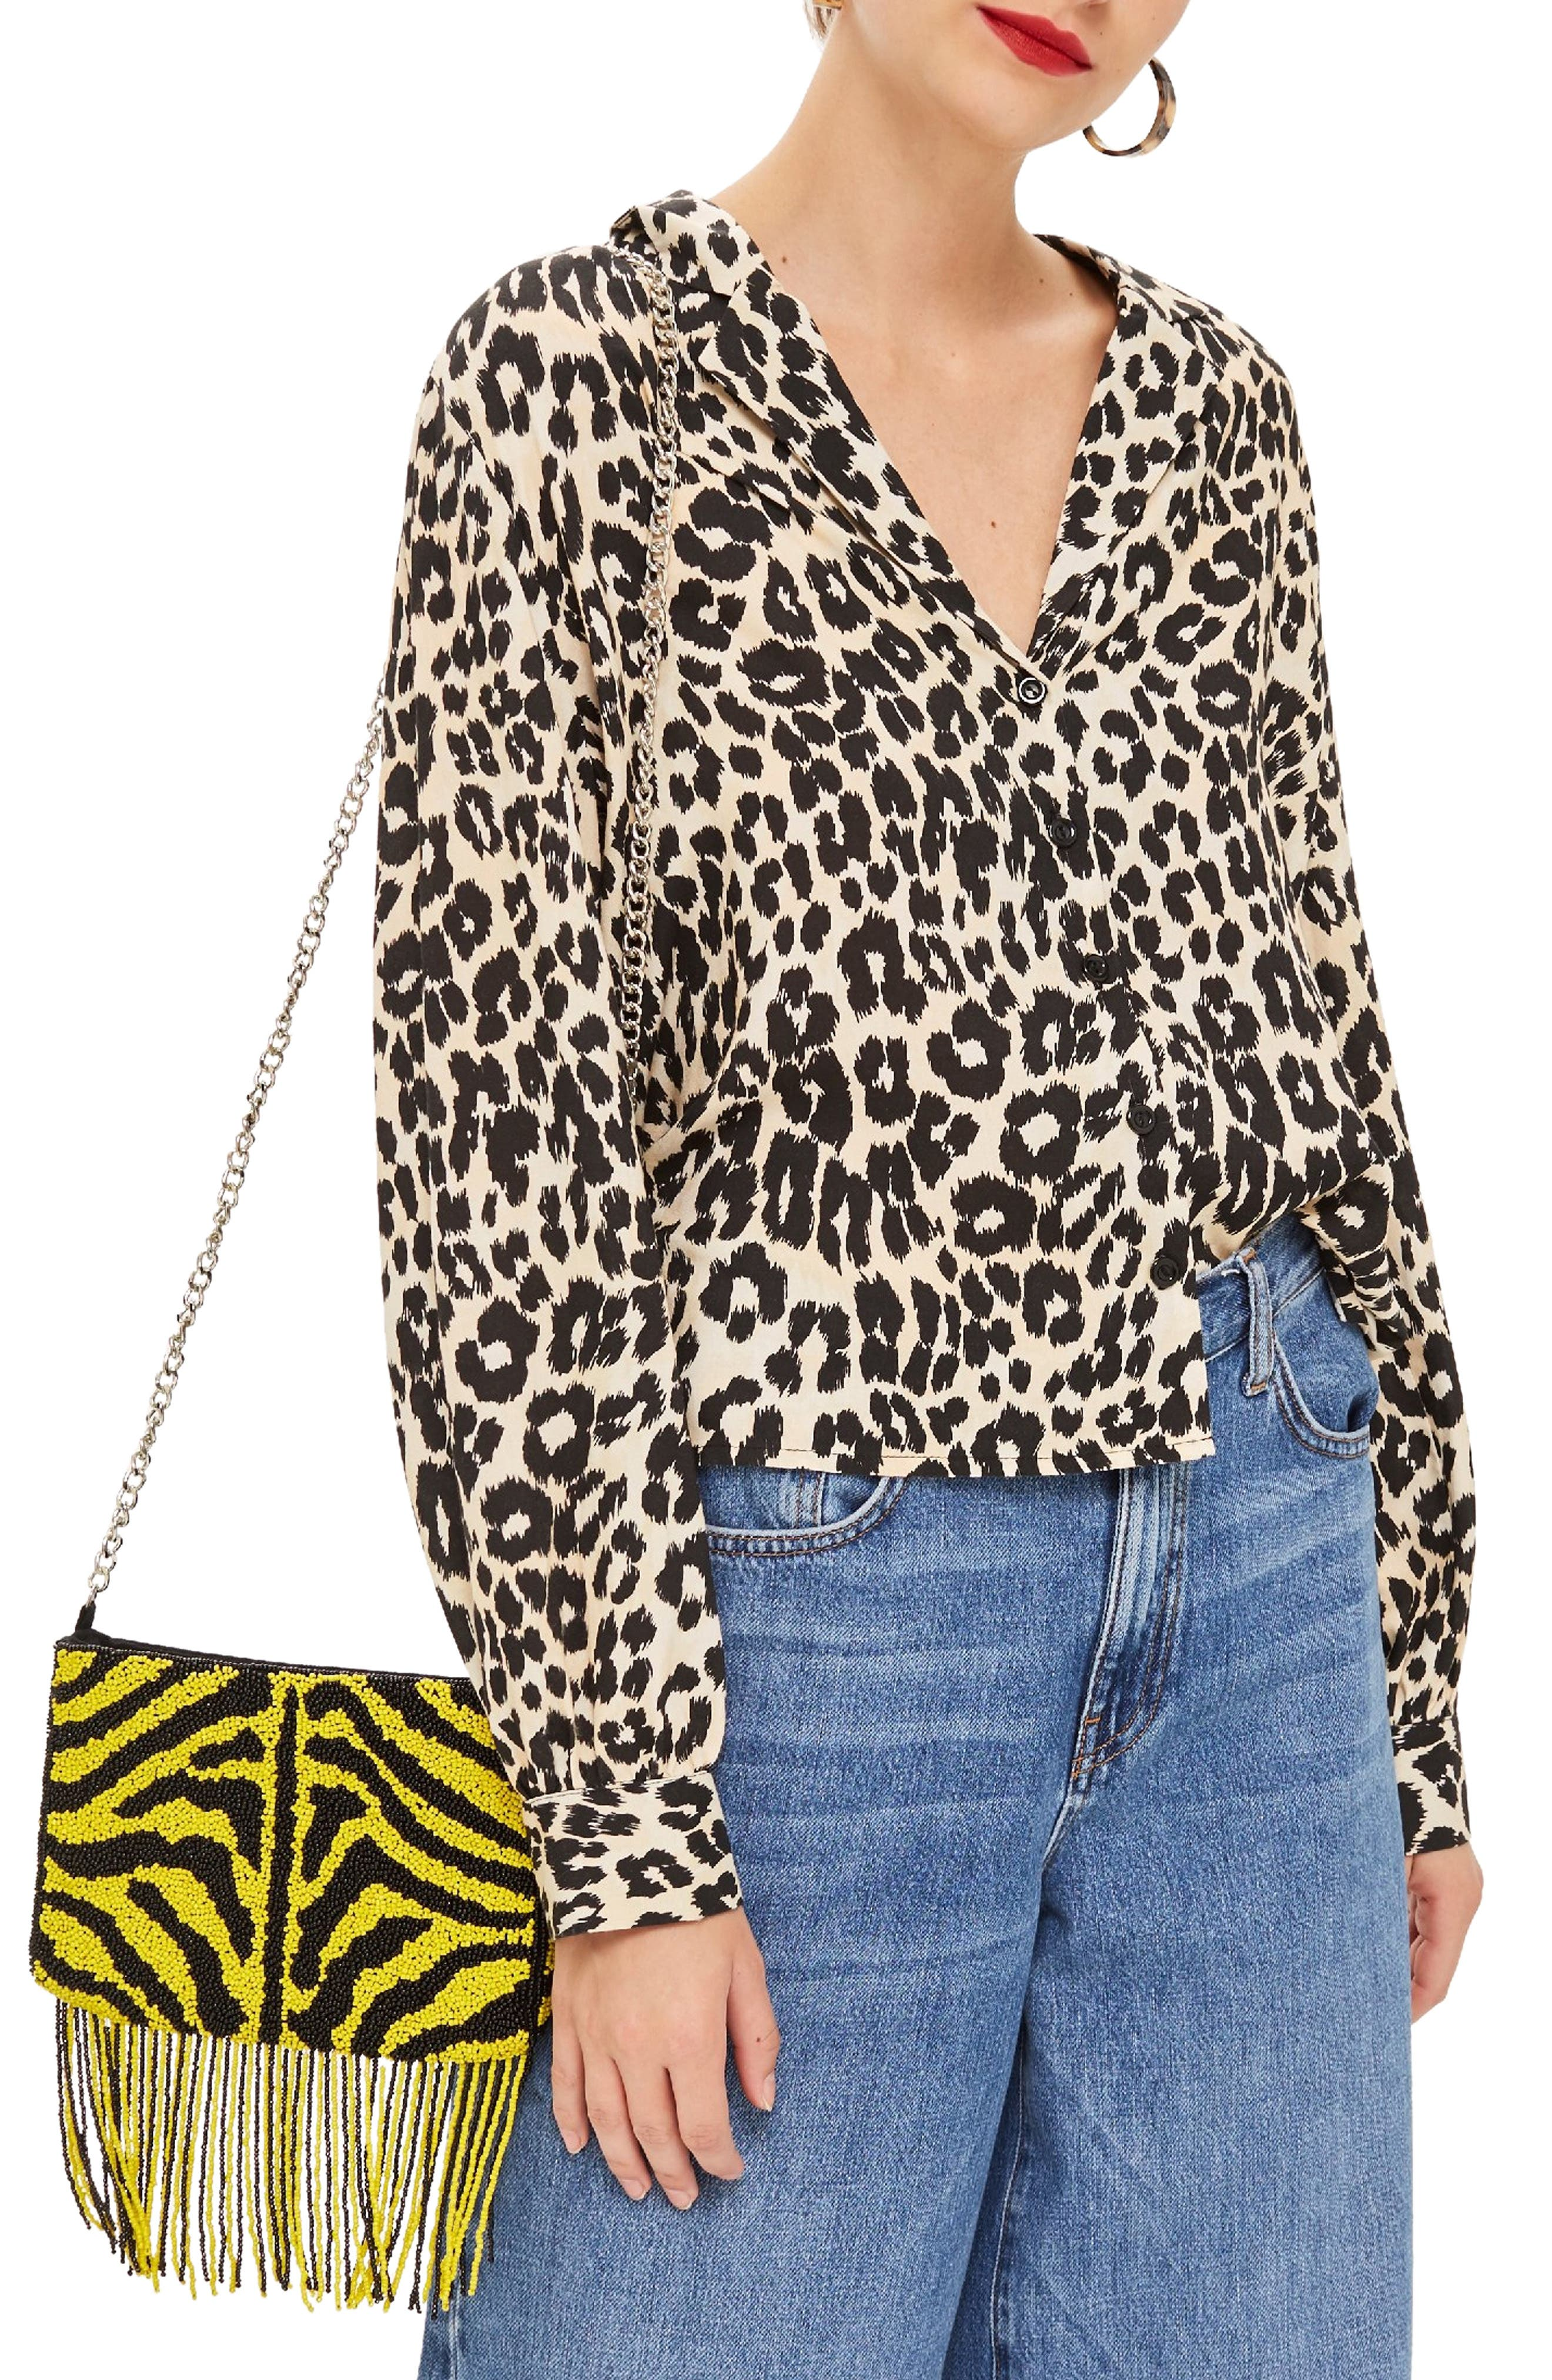 Jessica Animal Print Blouse,                         Main,                         color, BLACK MULTI